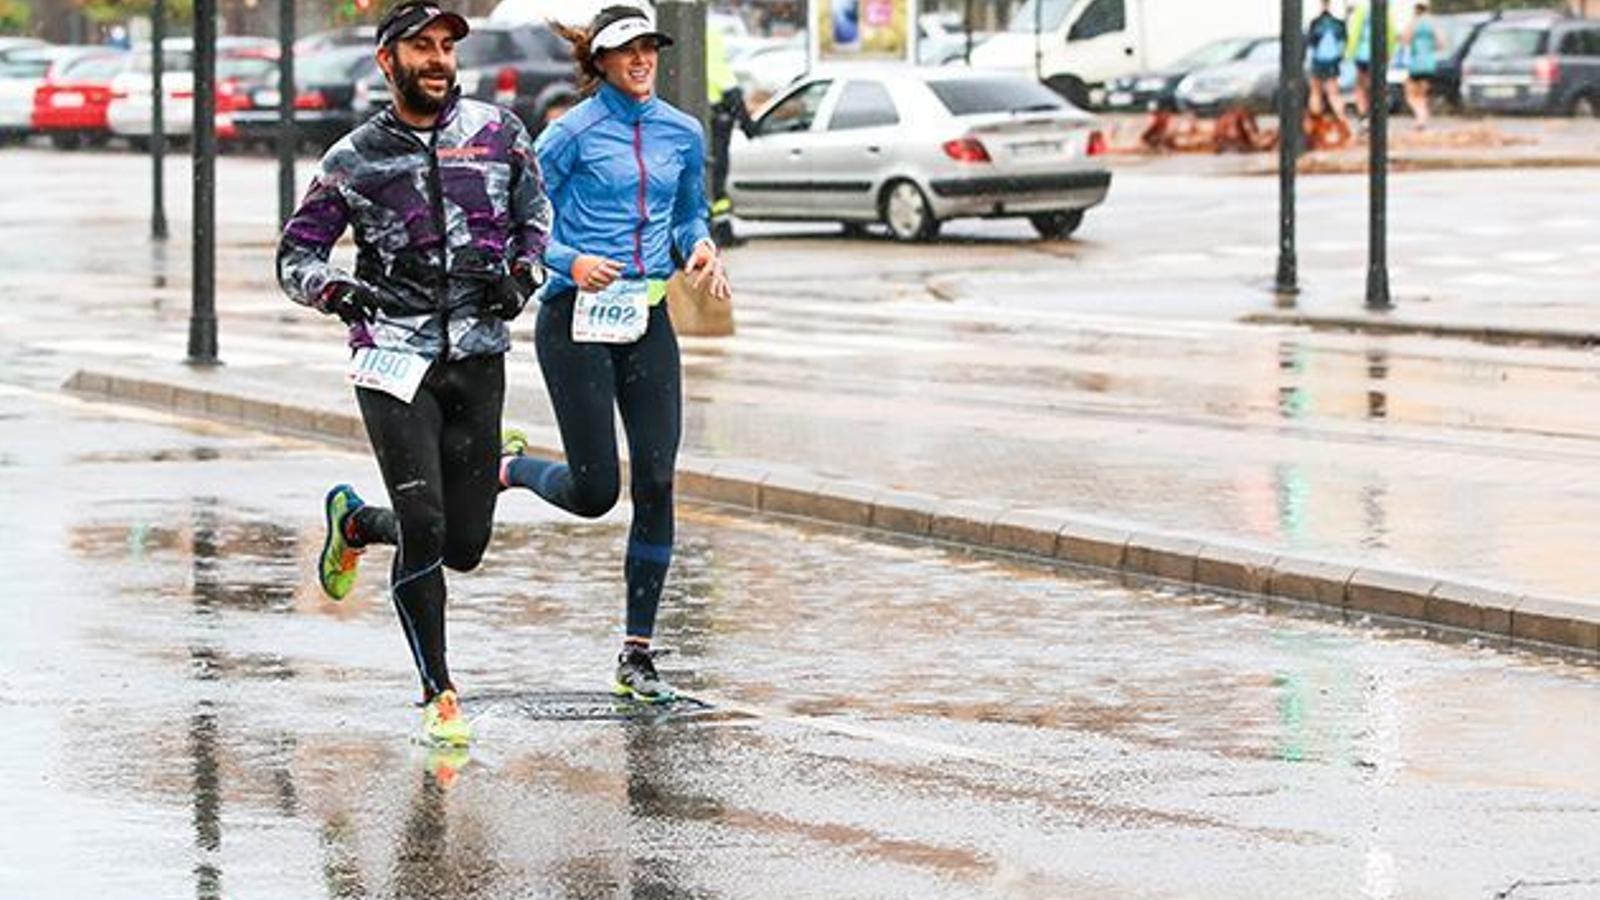 Quins beneficis té córrer quan plou?